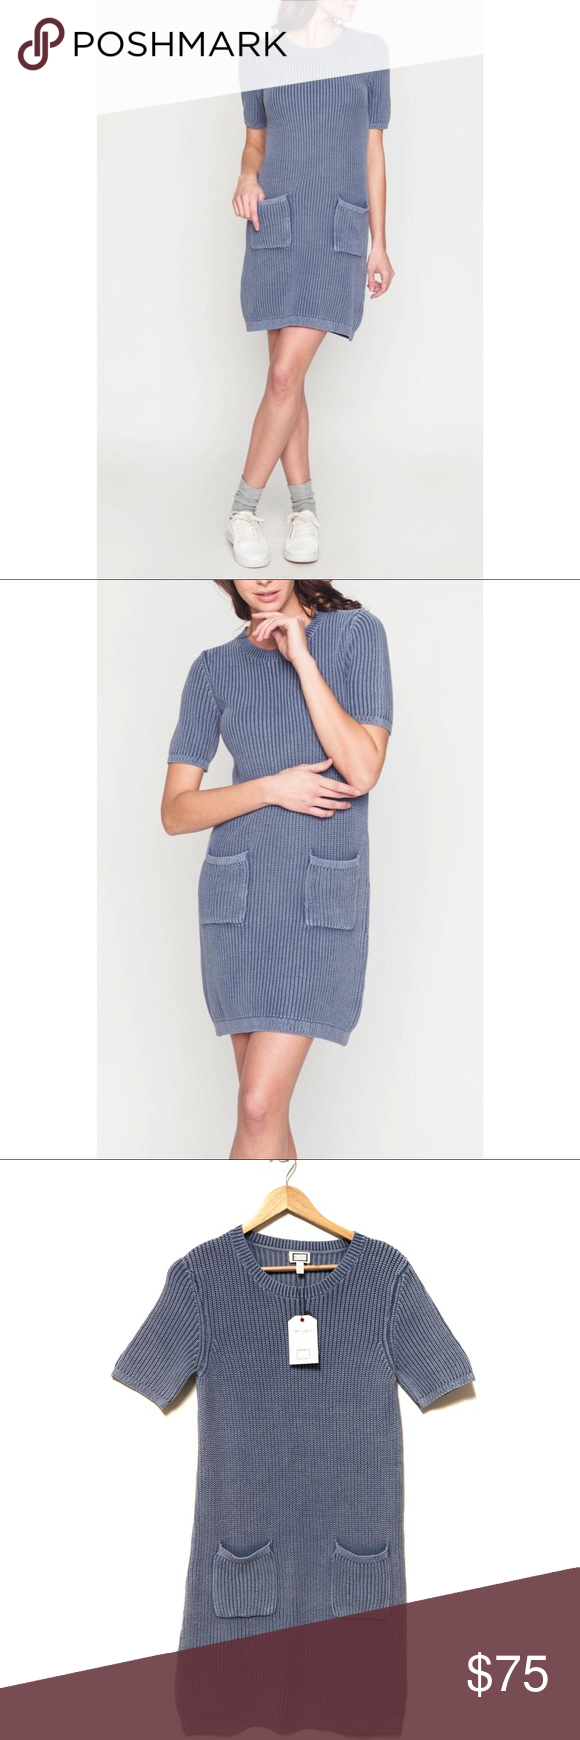 Wash Effect Short Sleeve Knit Sweater Dress Knit Sweater Dress Sweater Dress Knitted Sweaters [ 1740 x 580 Pixel ]